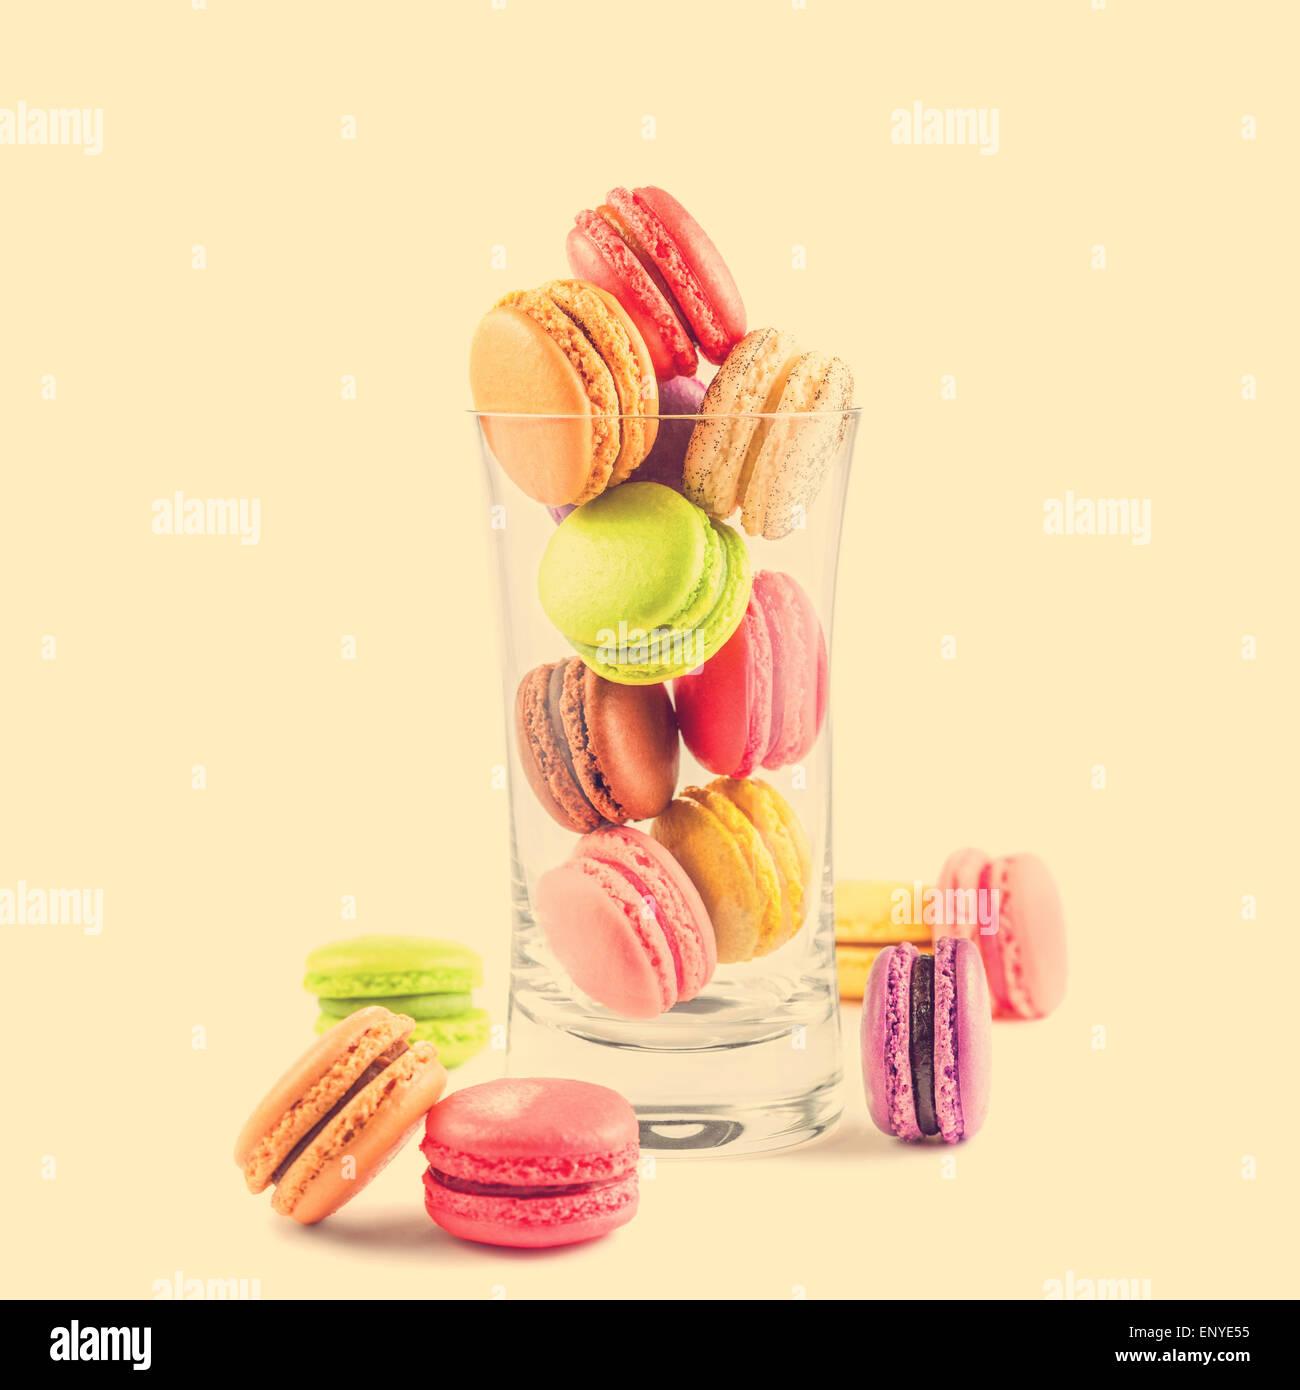 Coloridos macarons franceses en un vaso Foto de stock